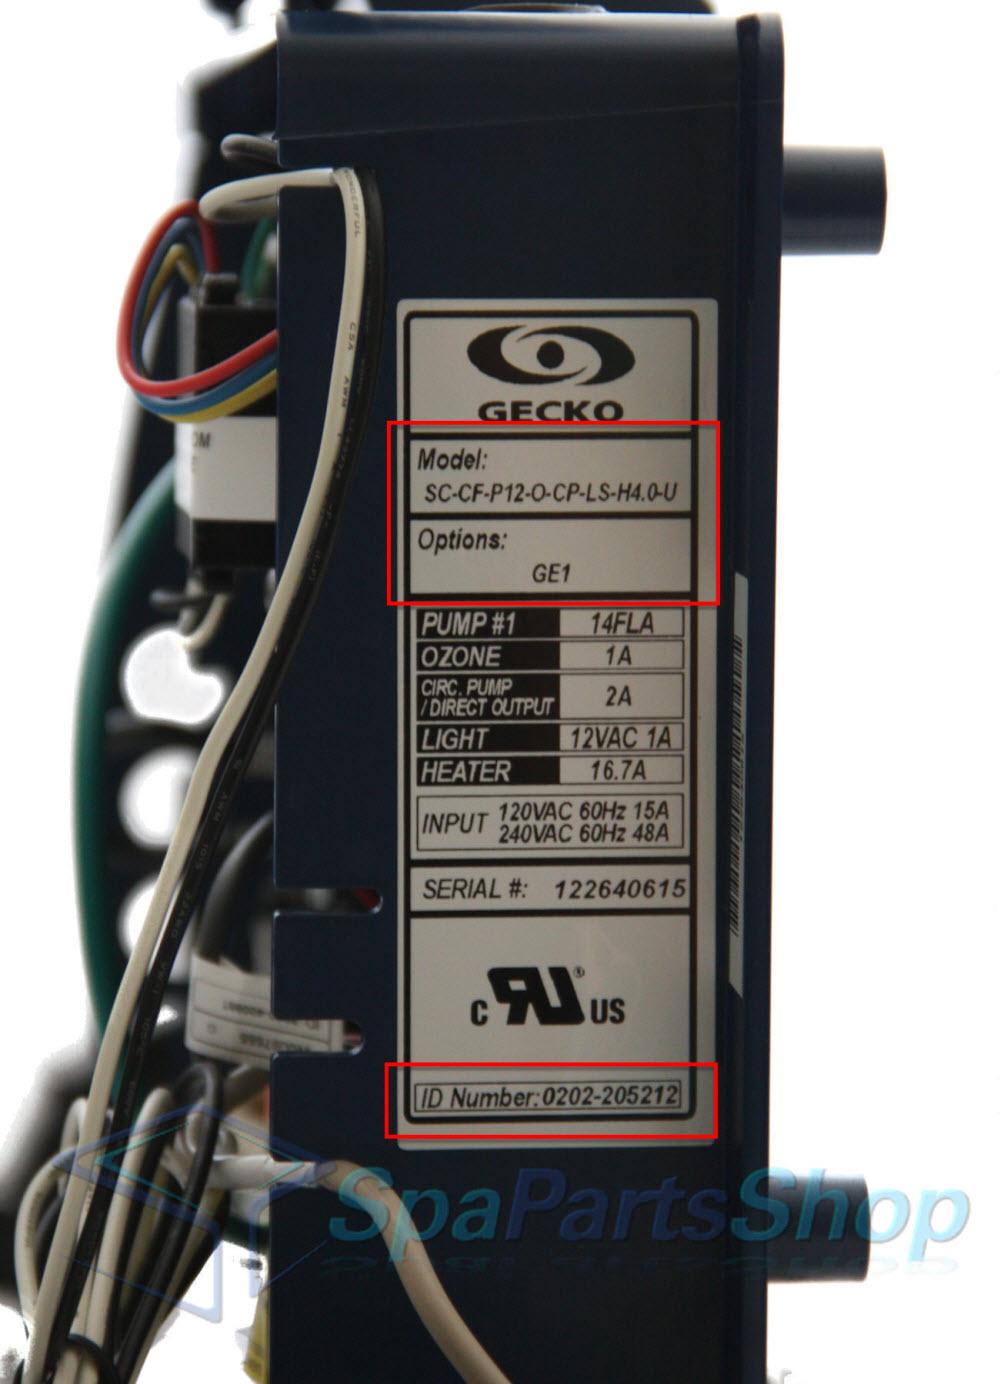 Superb Gecko Hot Tub Control Panel Wiring Diagram Wiring Library Wiring Digital Resources Remcakbiperorg